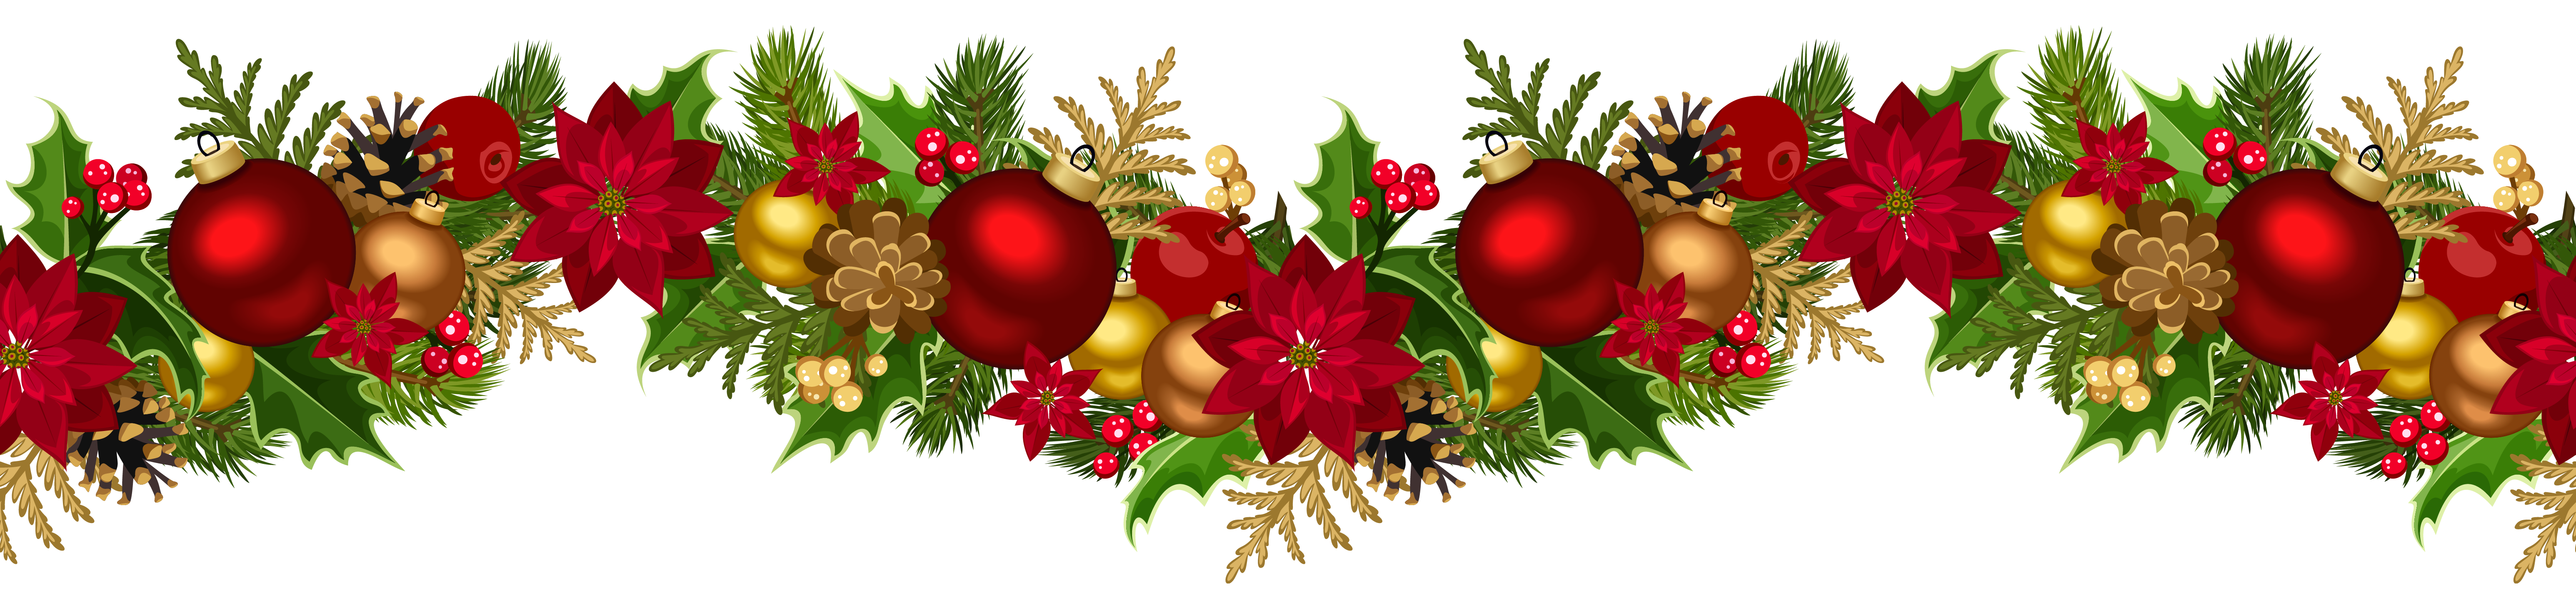 Christmas lemon clipart jpg transparent Lemon clipart garland, Lemon garland Transparent FREE for download ... jpg transparent